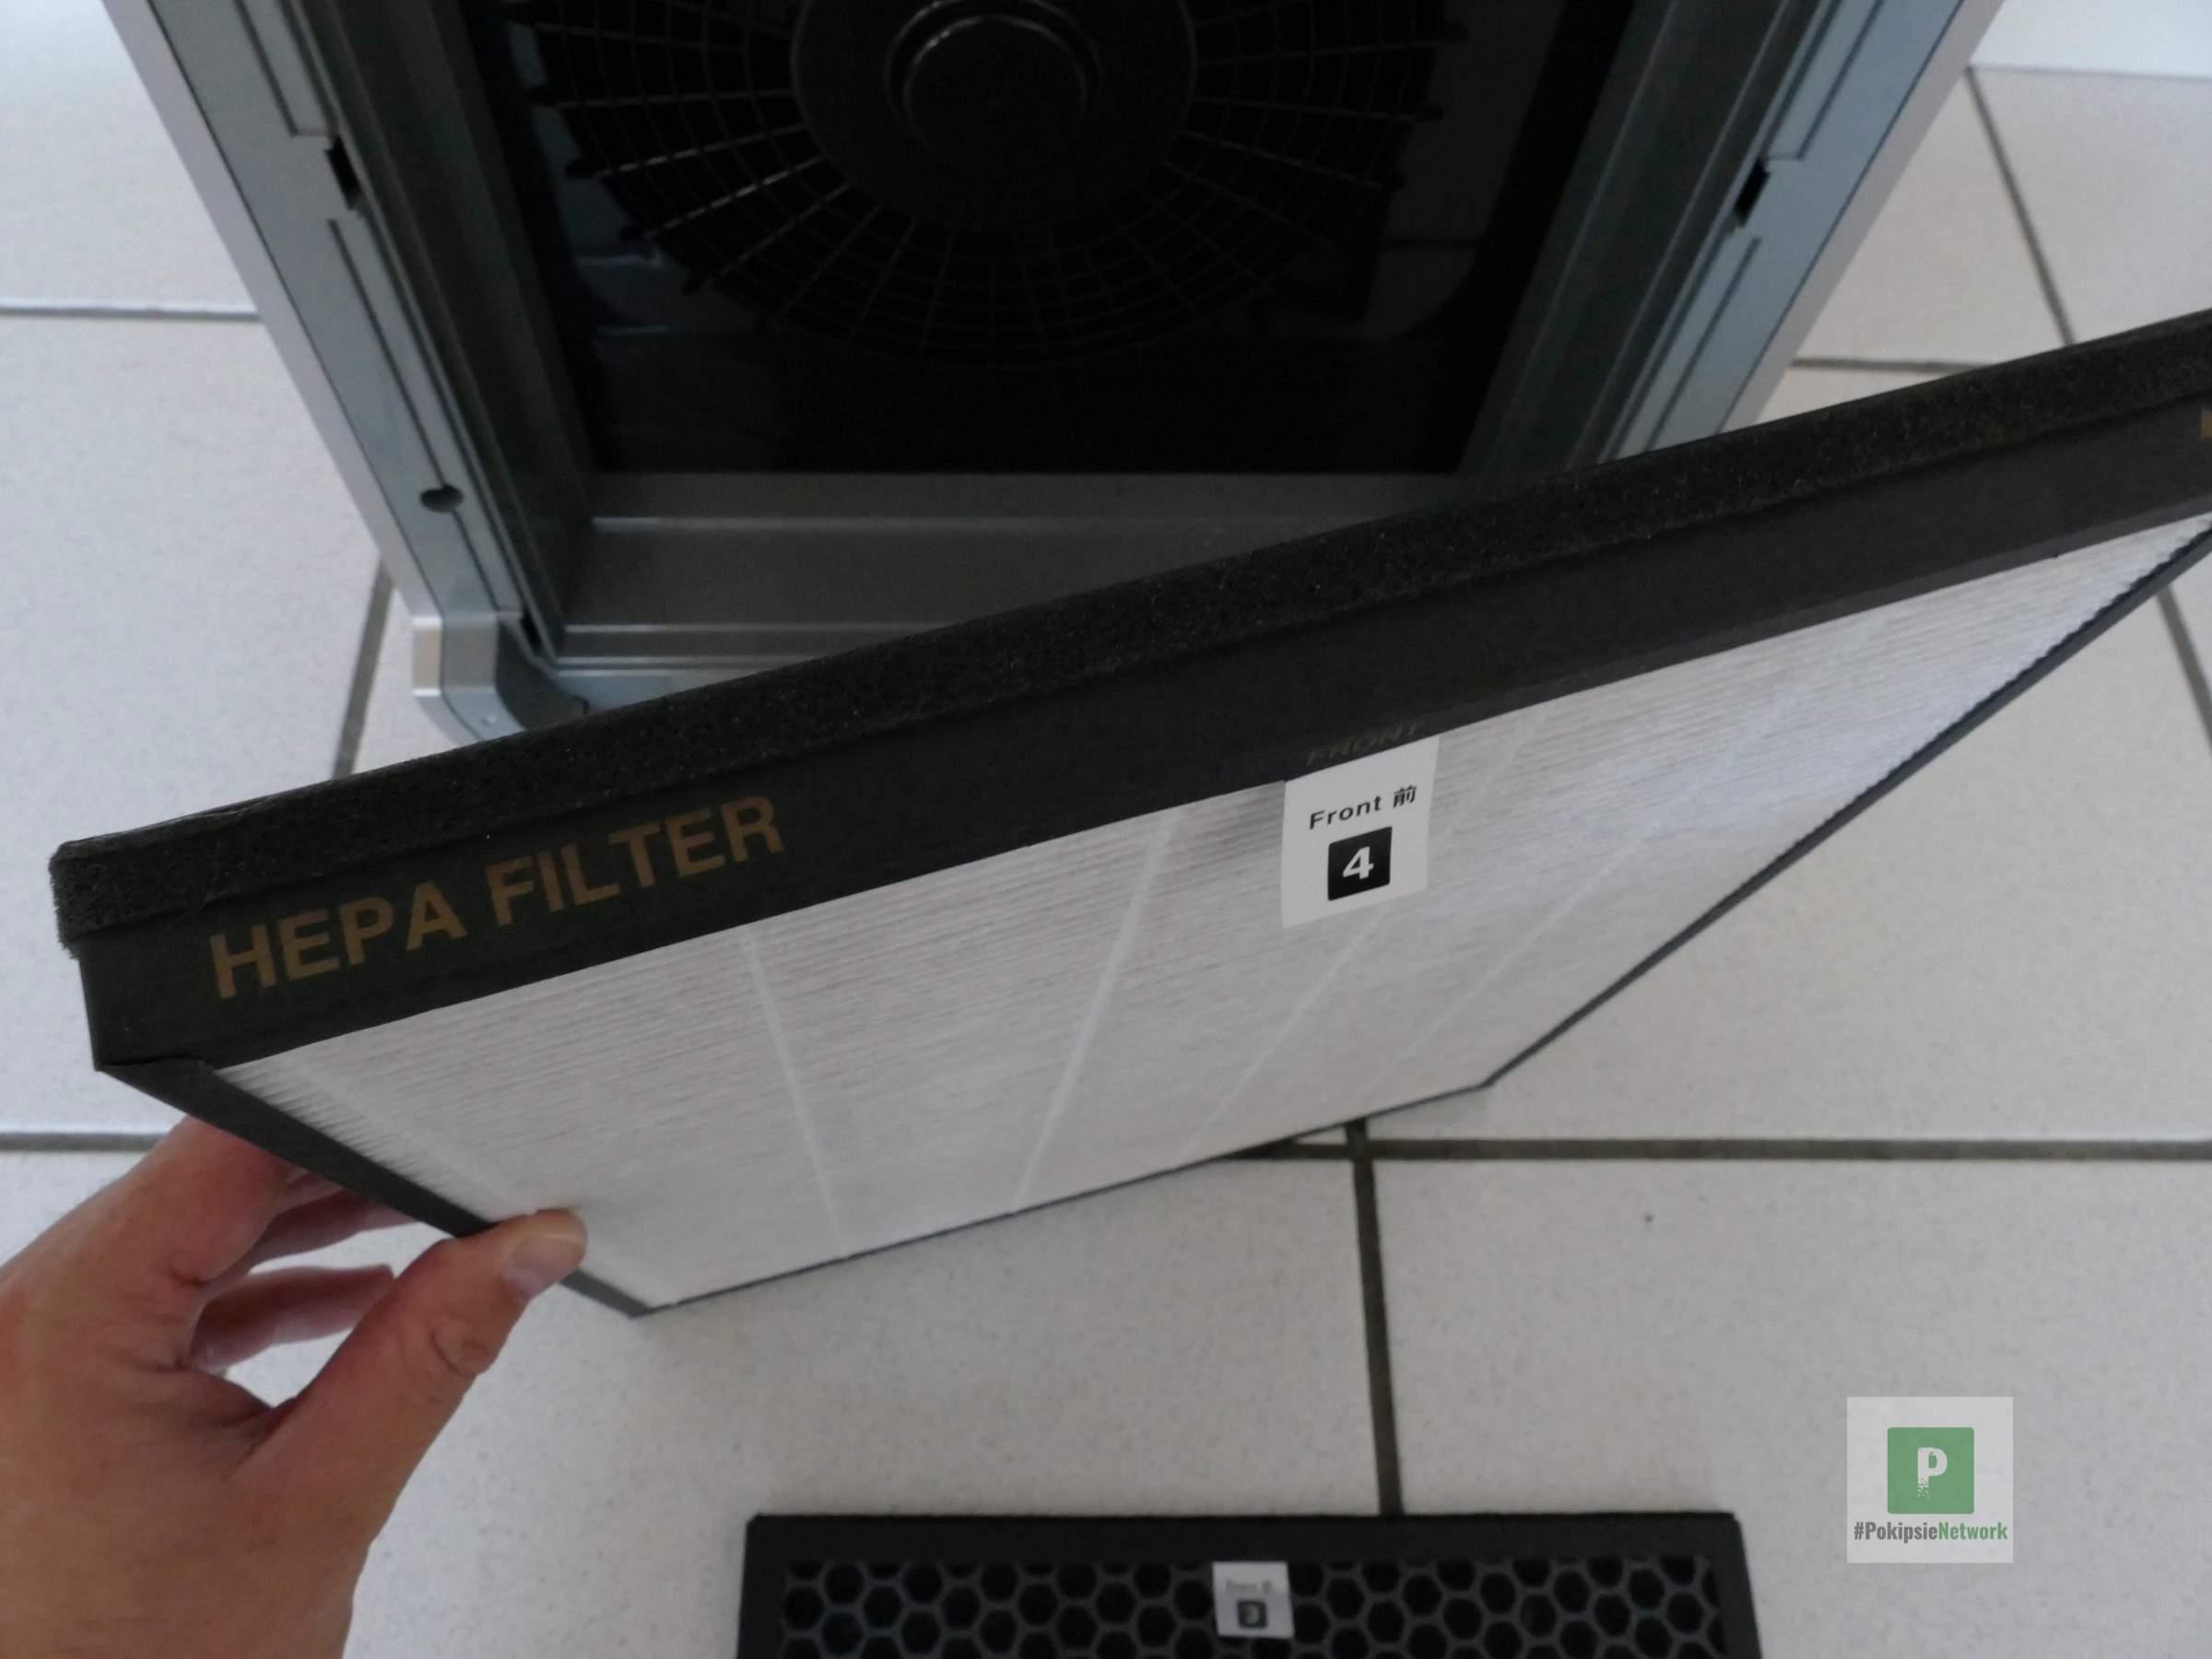 Der HEPA Filter